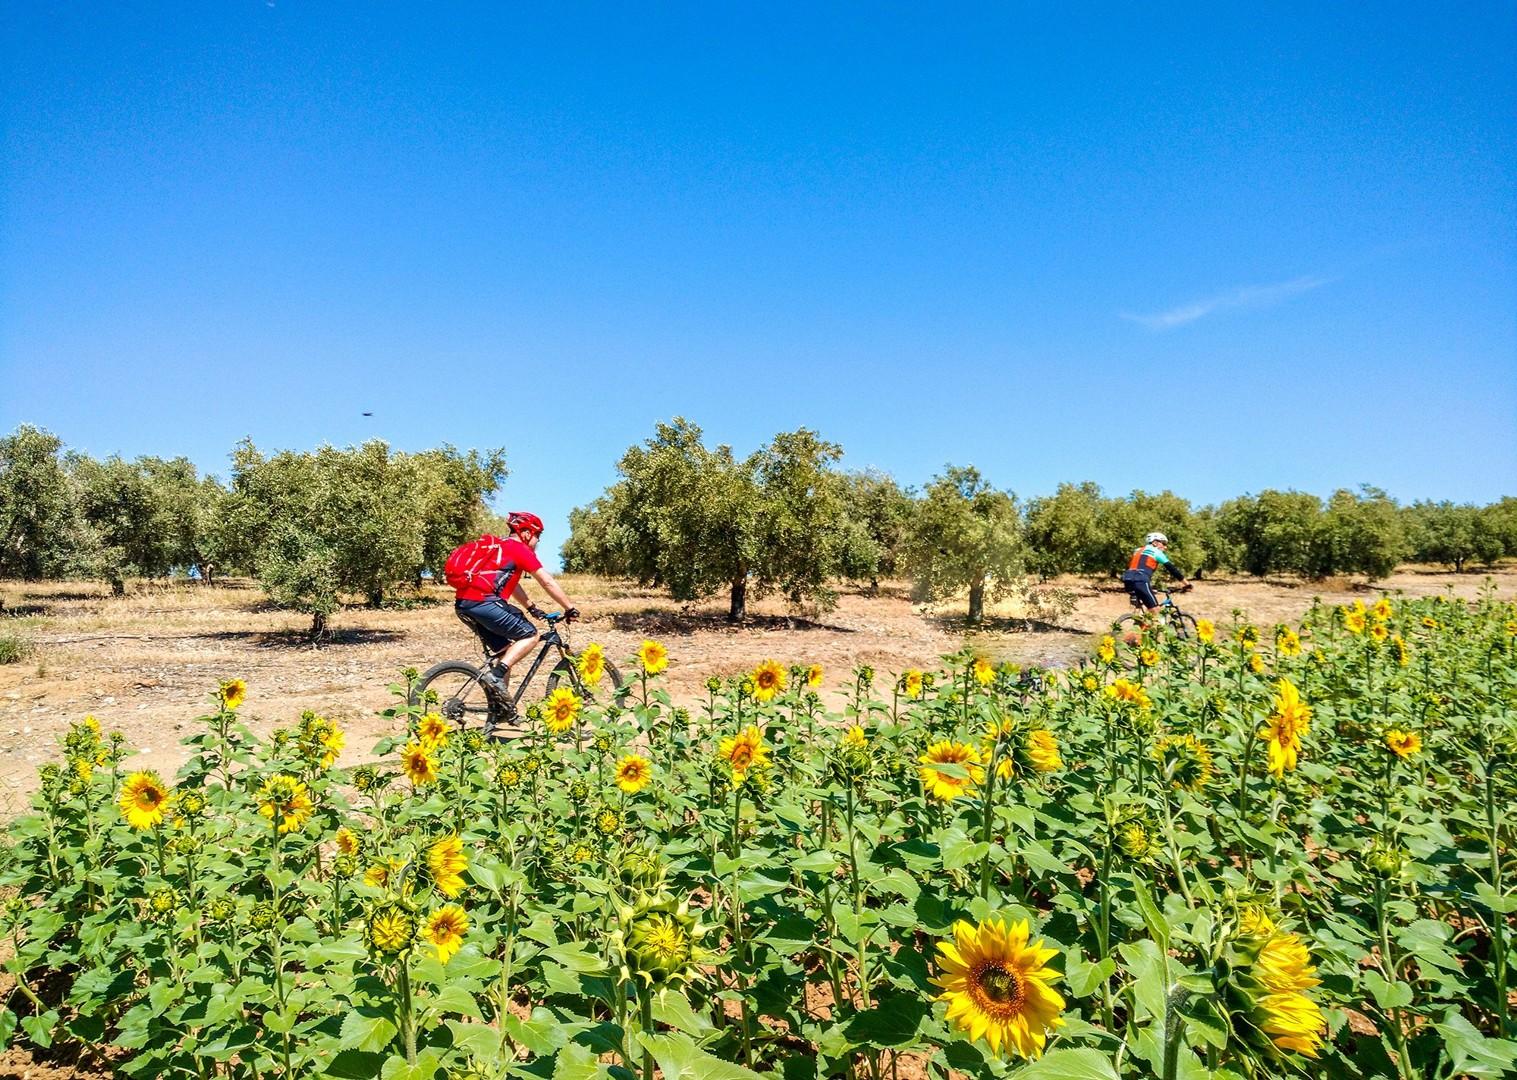 IMG_20170507_122824695.jpg - Spain - Ruta de la Plata - Guided Mountain Bike Holiday - Mountain Biking